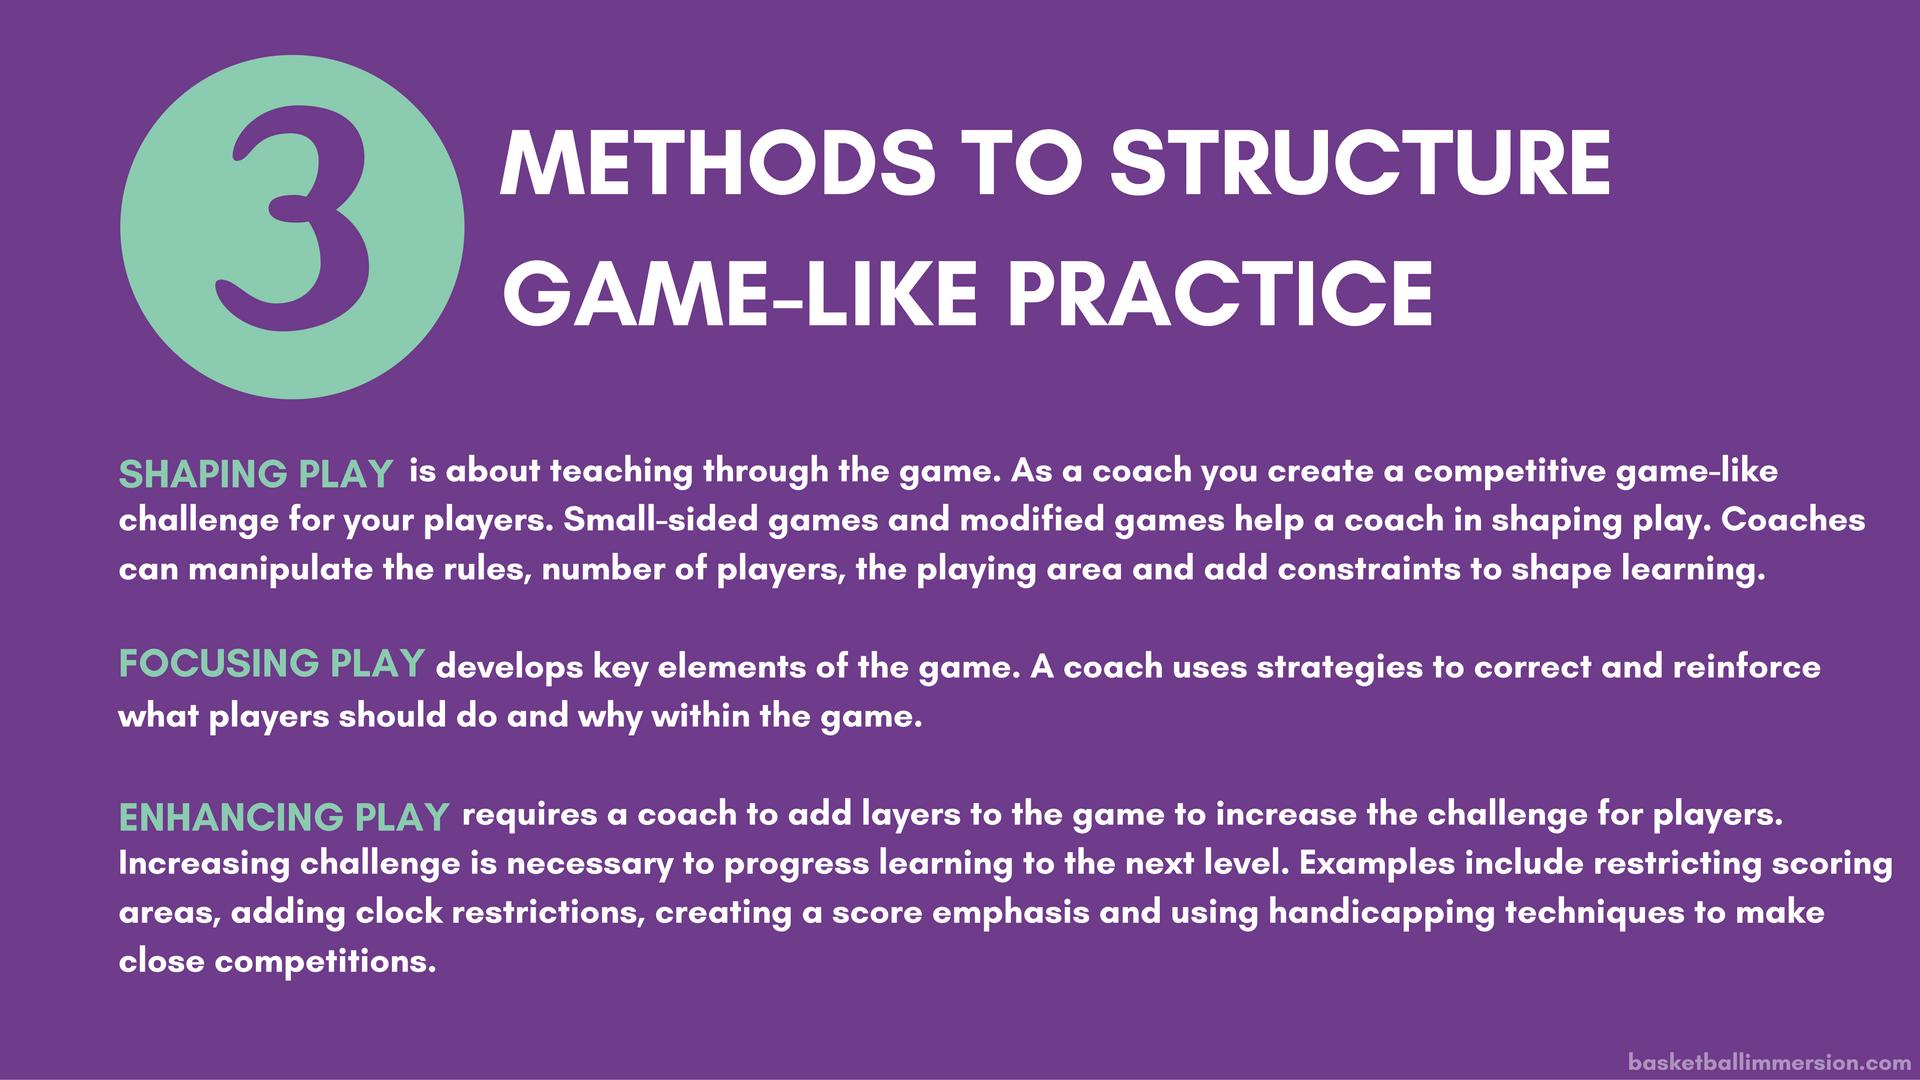 shaping-focusing-enhancing-play